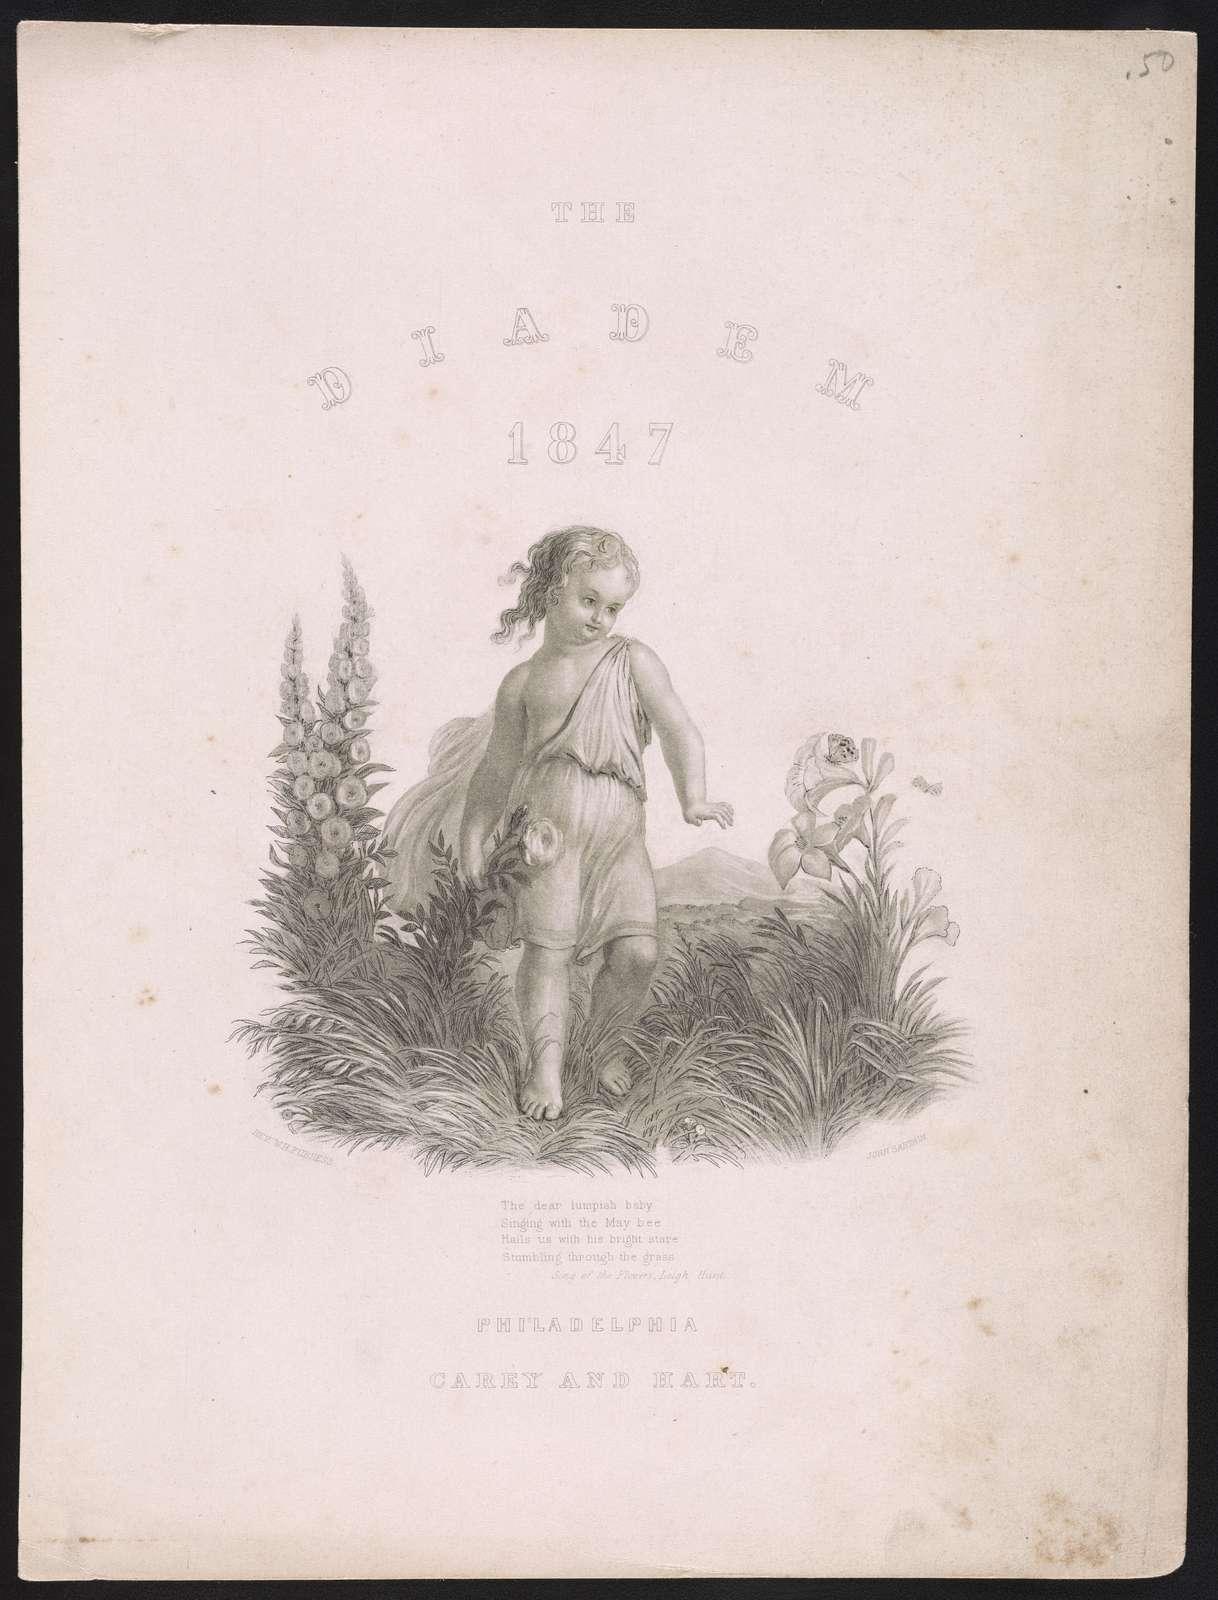 The Diadem 1847 / Rev. W.H. Furness ; John Sartain.